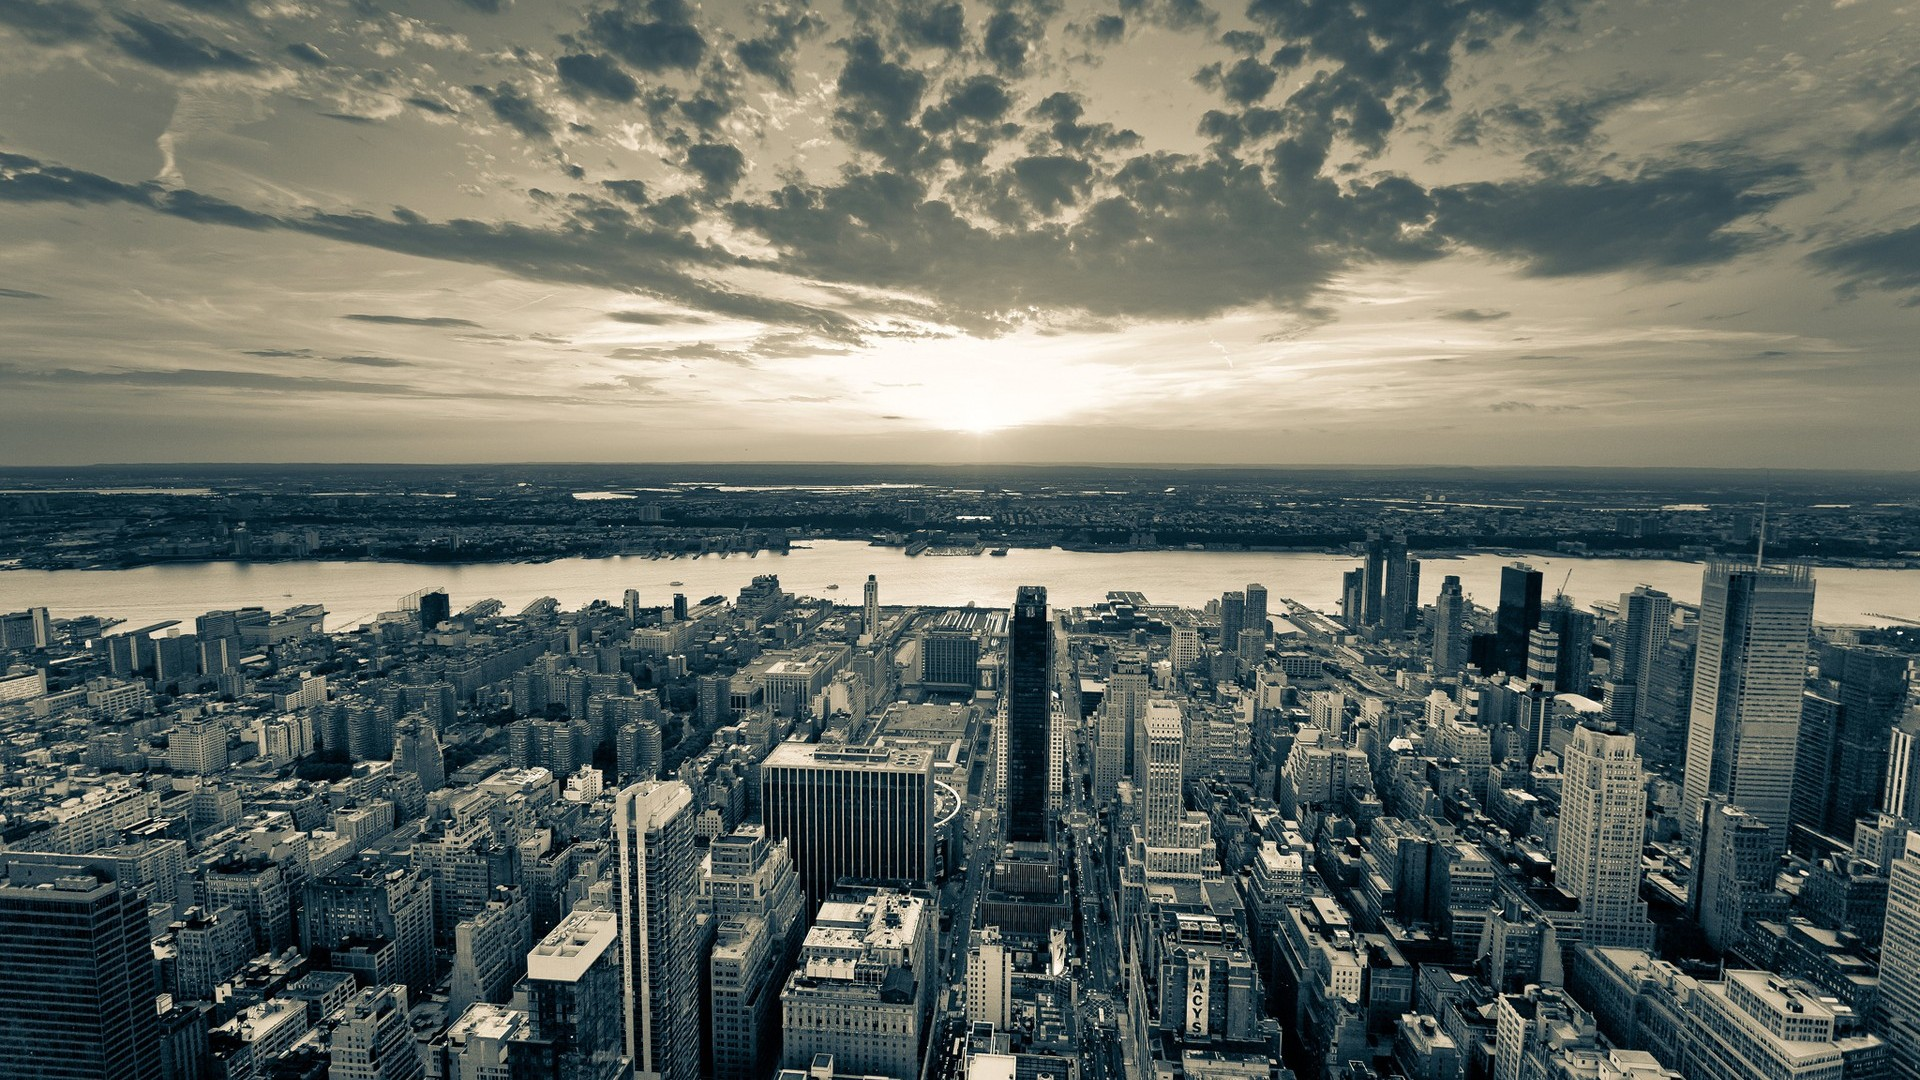 High Resolution Black and White New York Skyline Wallpaper HD 8 Full 1920x1080